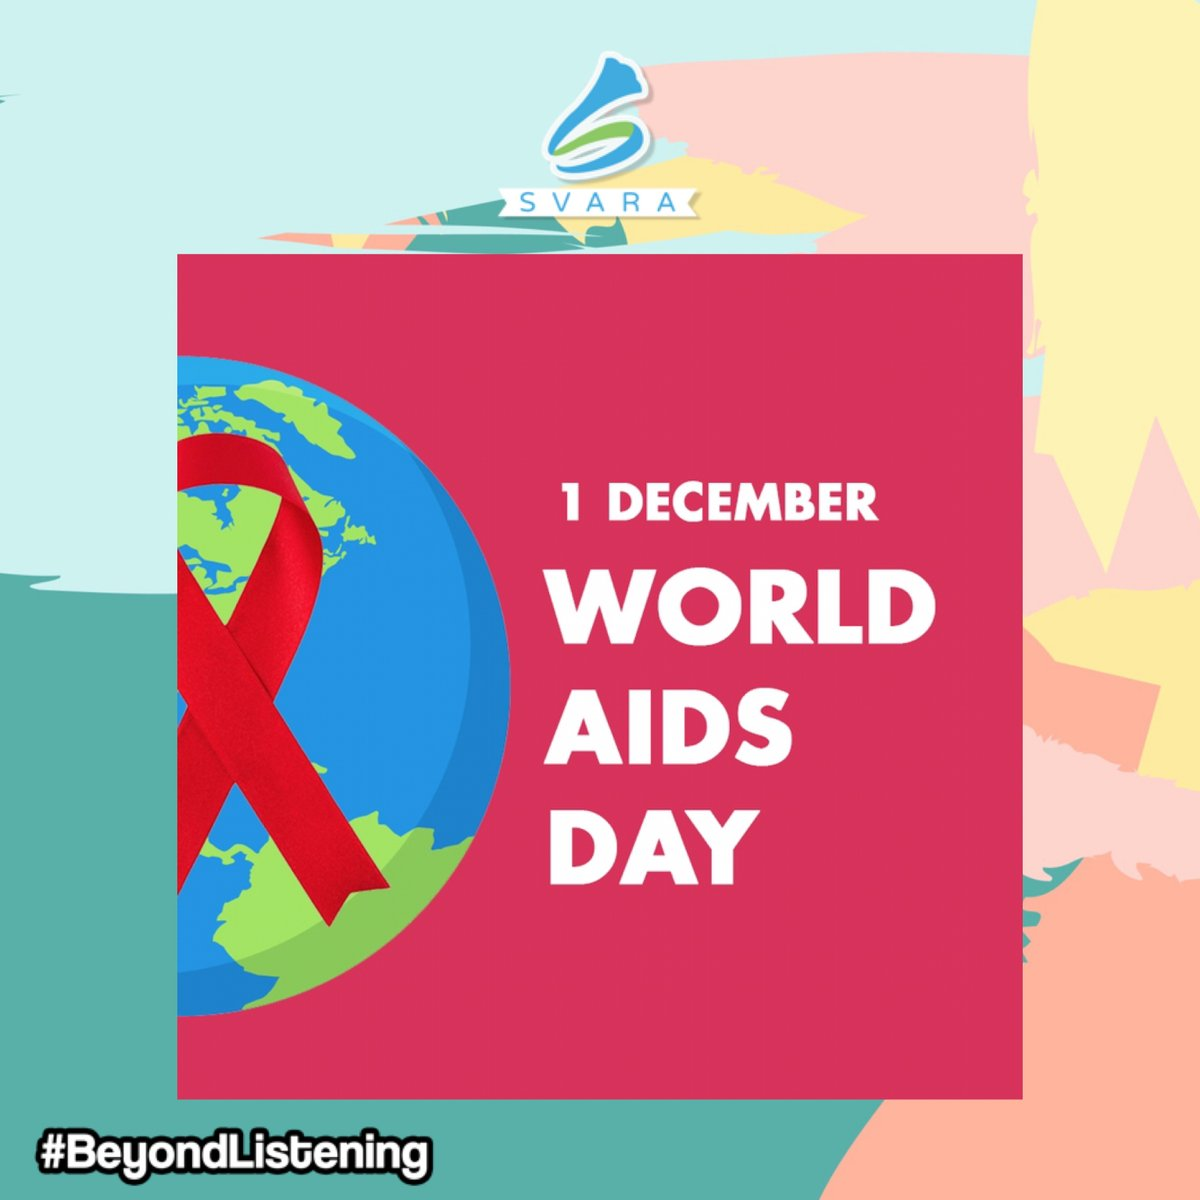 Mari lindungi orang-orang terdekat kita dari bahaya HIV/AIDS. Selamat memperingati hari HIV/AIDS sedunia. Jauhi penyakitnya, Bukan orangnya!! . . . #SVARA #beyondlistening pic.twitter.com/J4CK4jLCUk